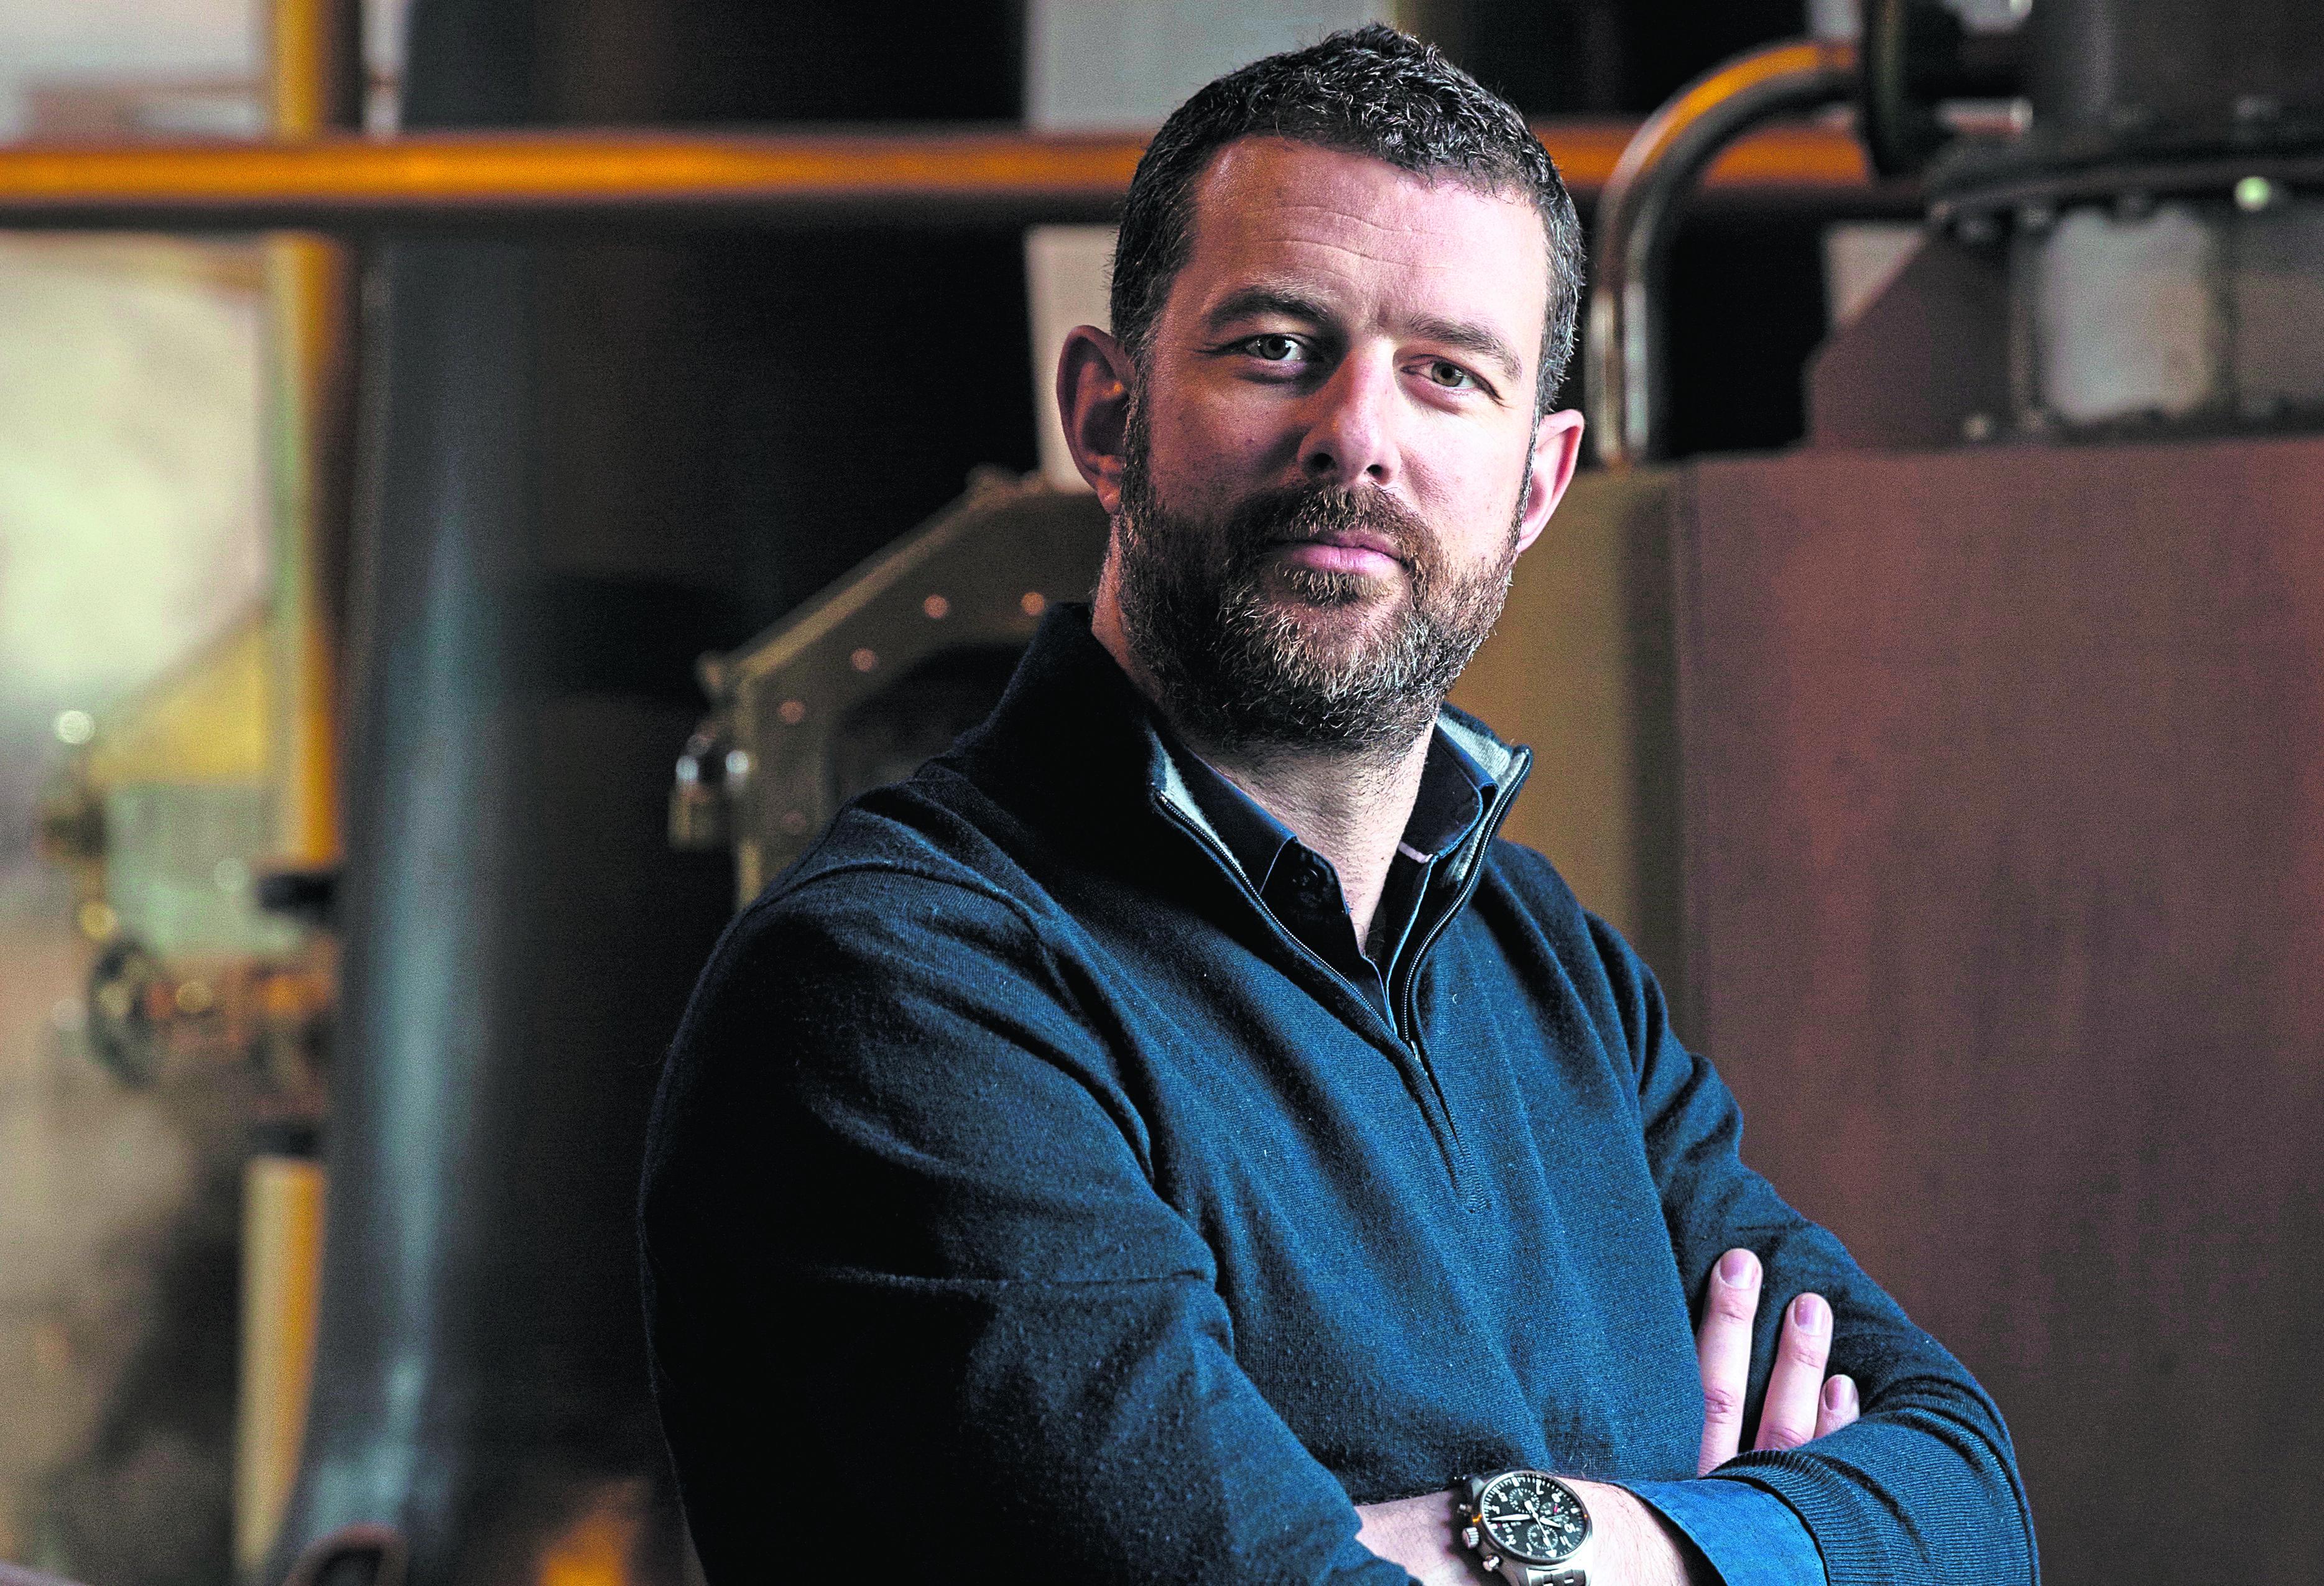 Bruichladdich Distillery CEO Douglas Taylor.